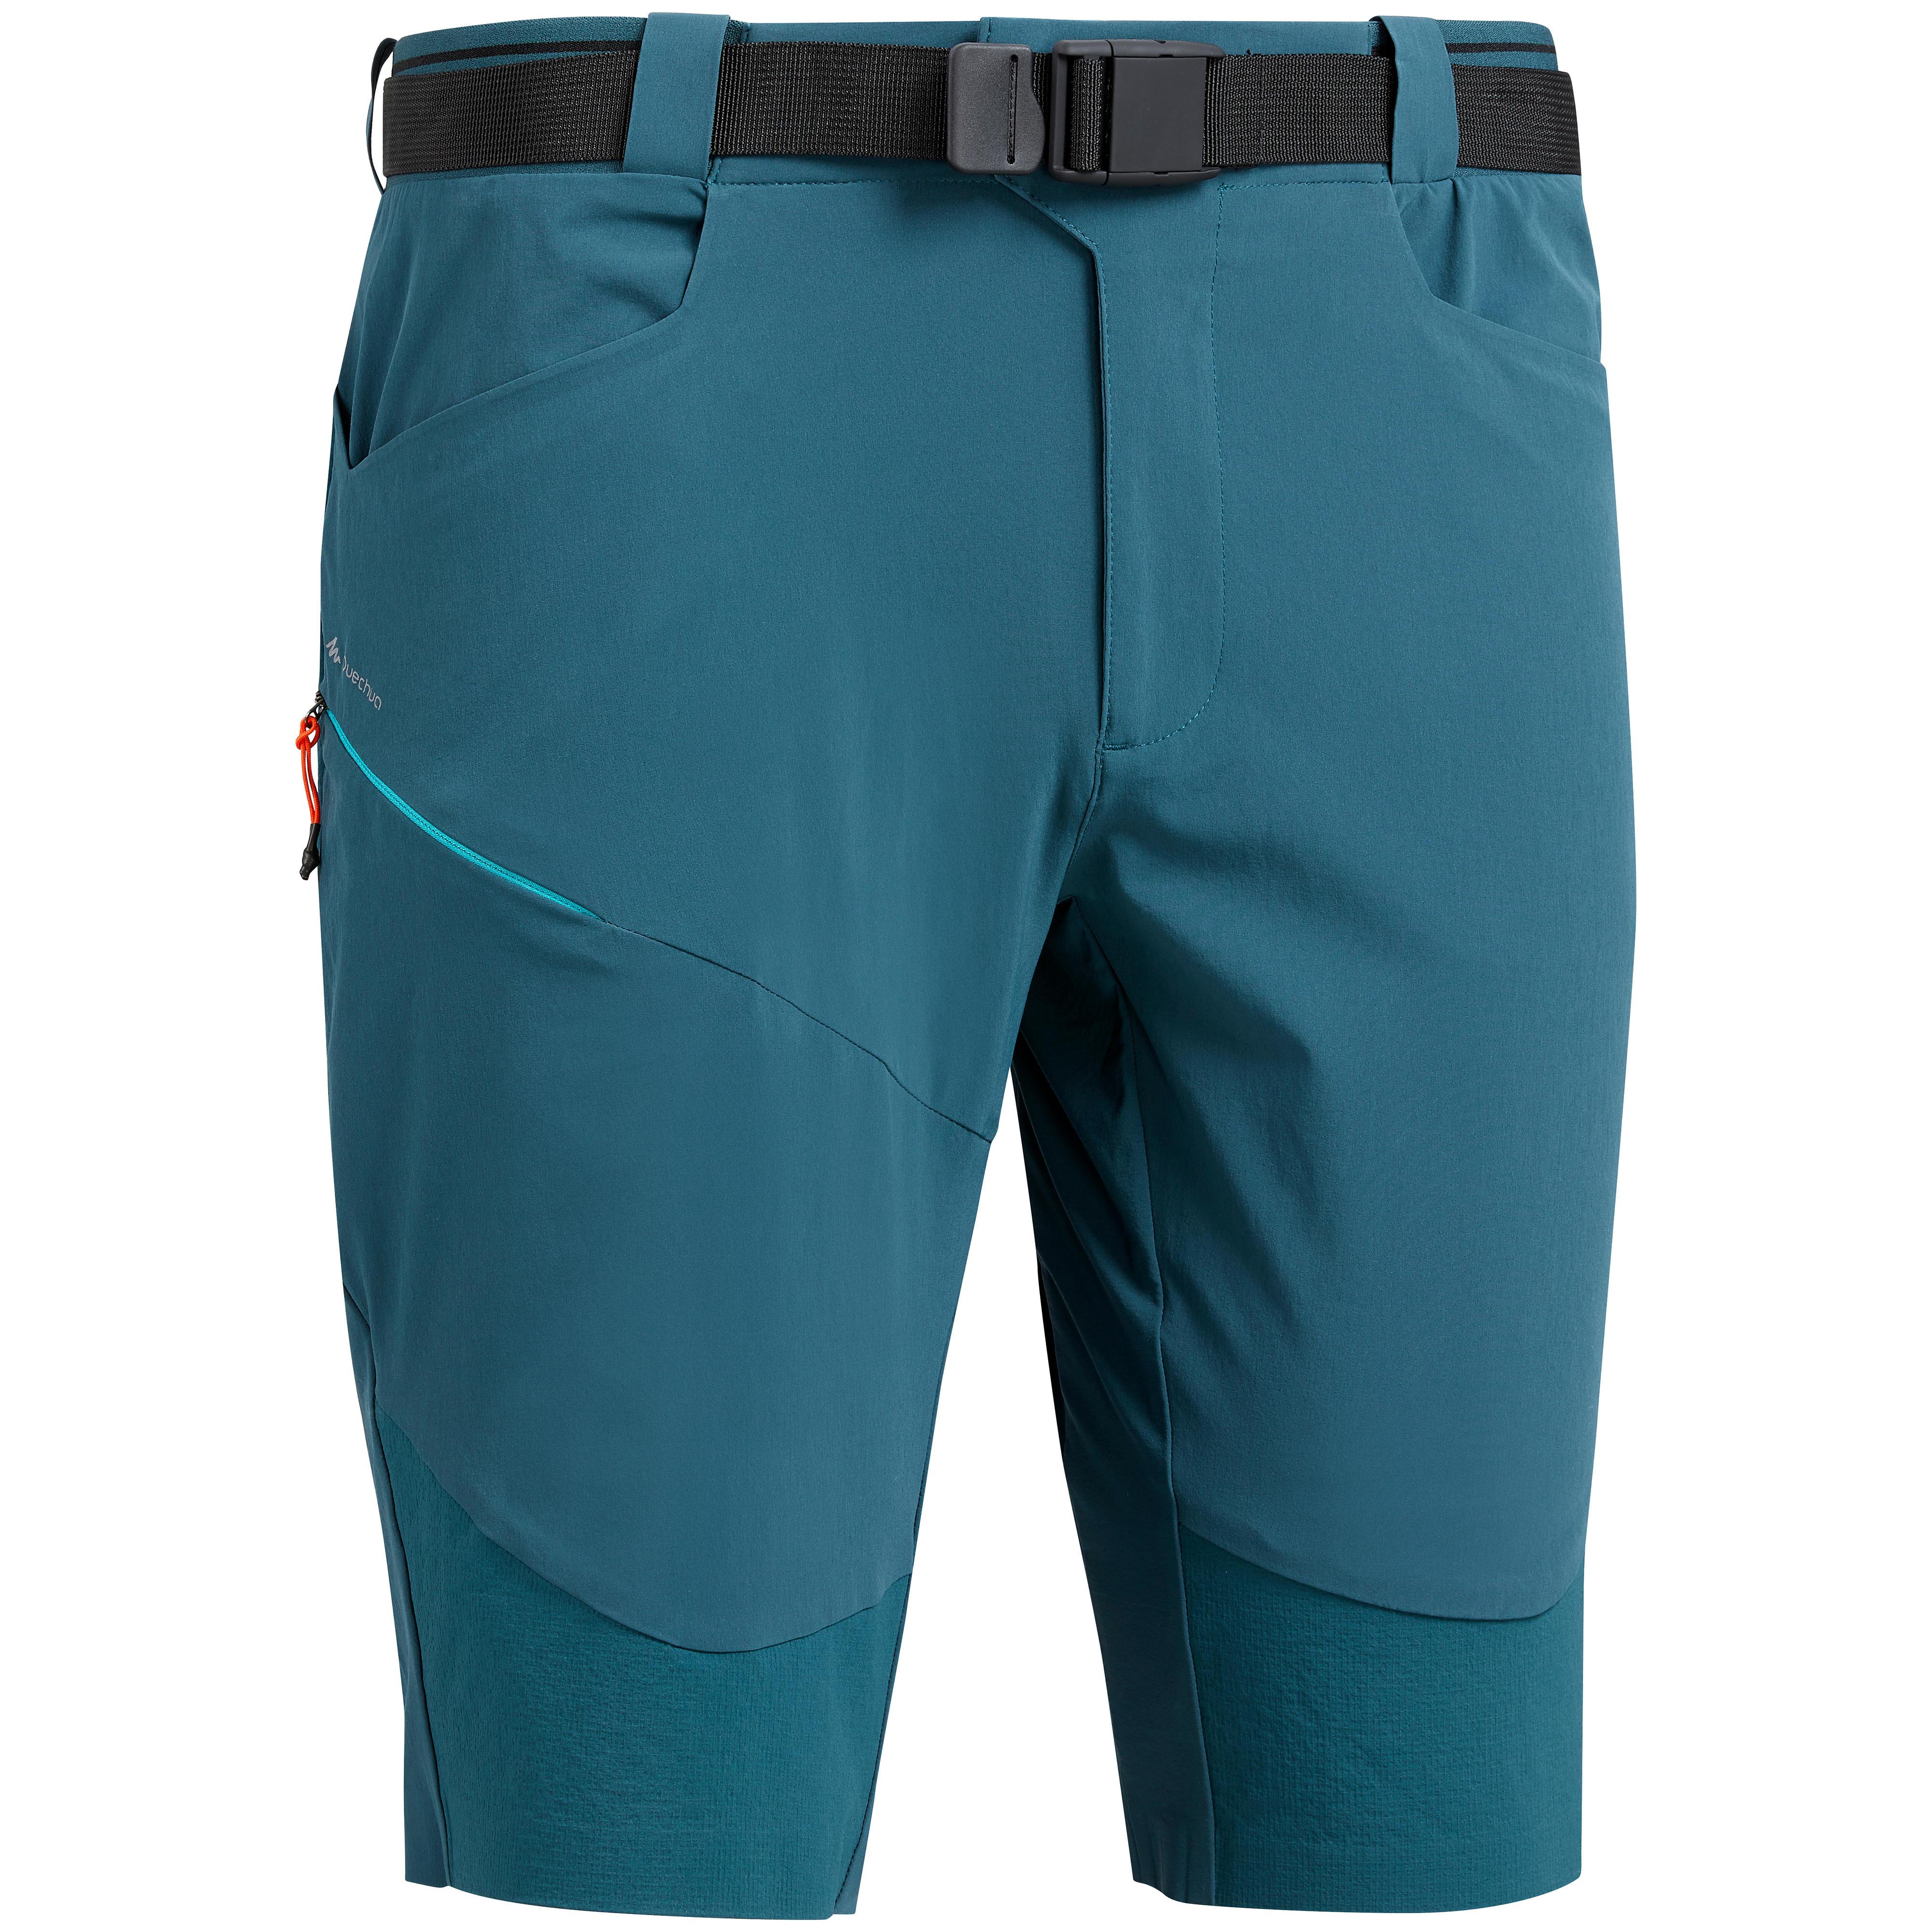 Wandershorts Bergwandern MH500 knielang Herren blau | Bekleidung > Shorts & Bermudas > Trekkingshorts | Blau - Türkis | Quechua